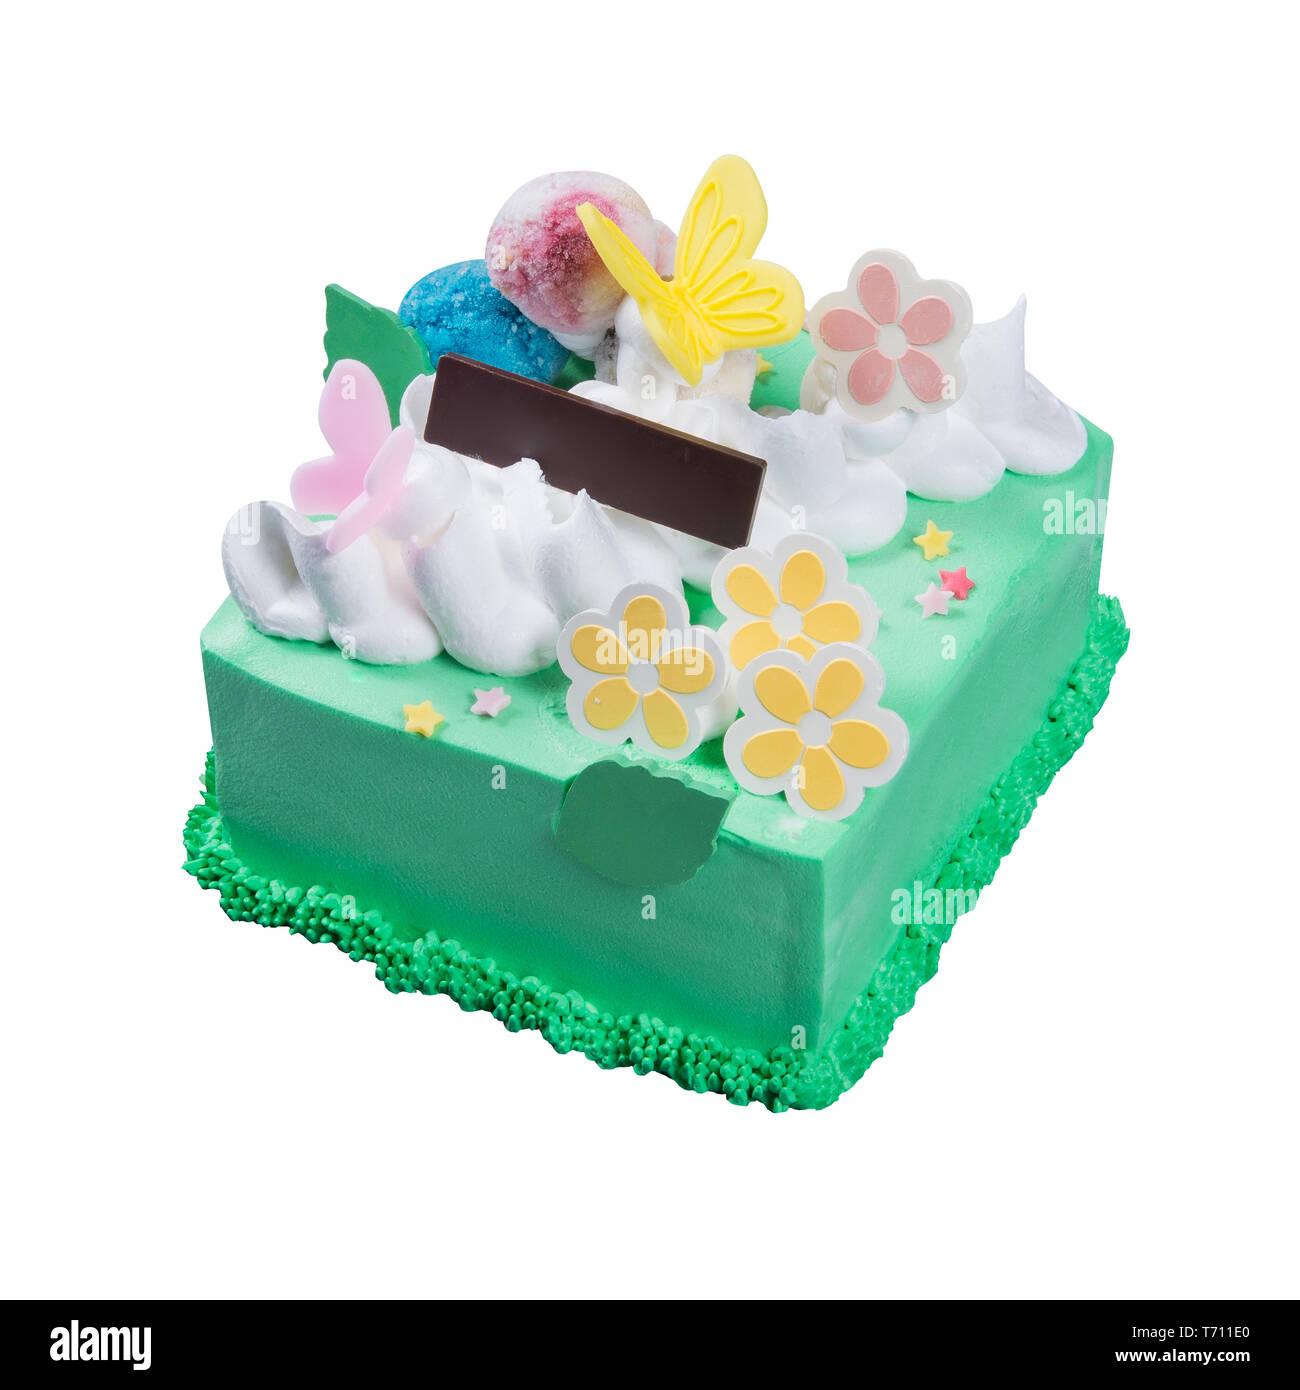 Outstanding Cake Or Ice Cream Birthday Cake On A Background Stock Photo Funny Birthday Cards Online Hendilapandamsfinfo